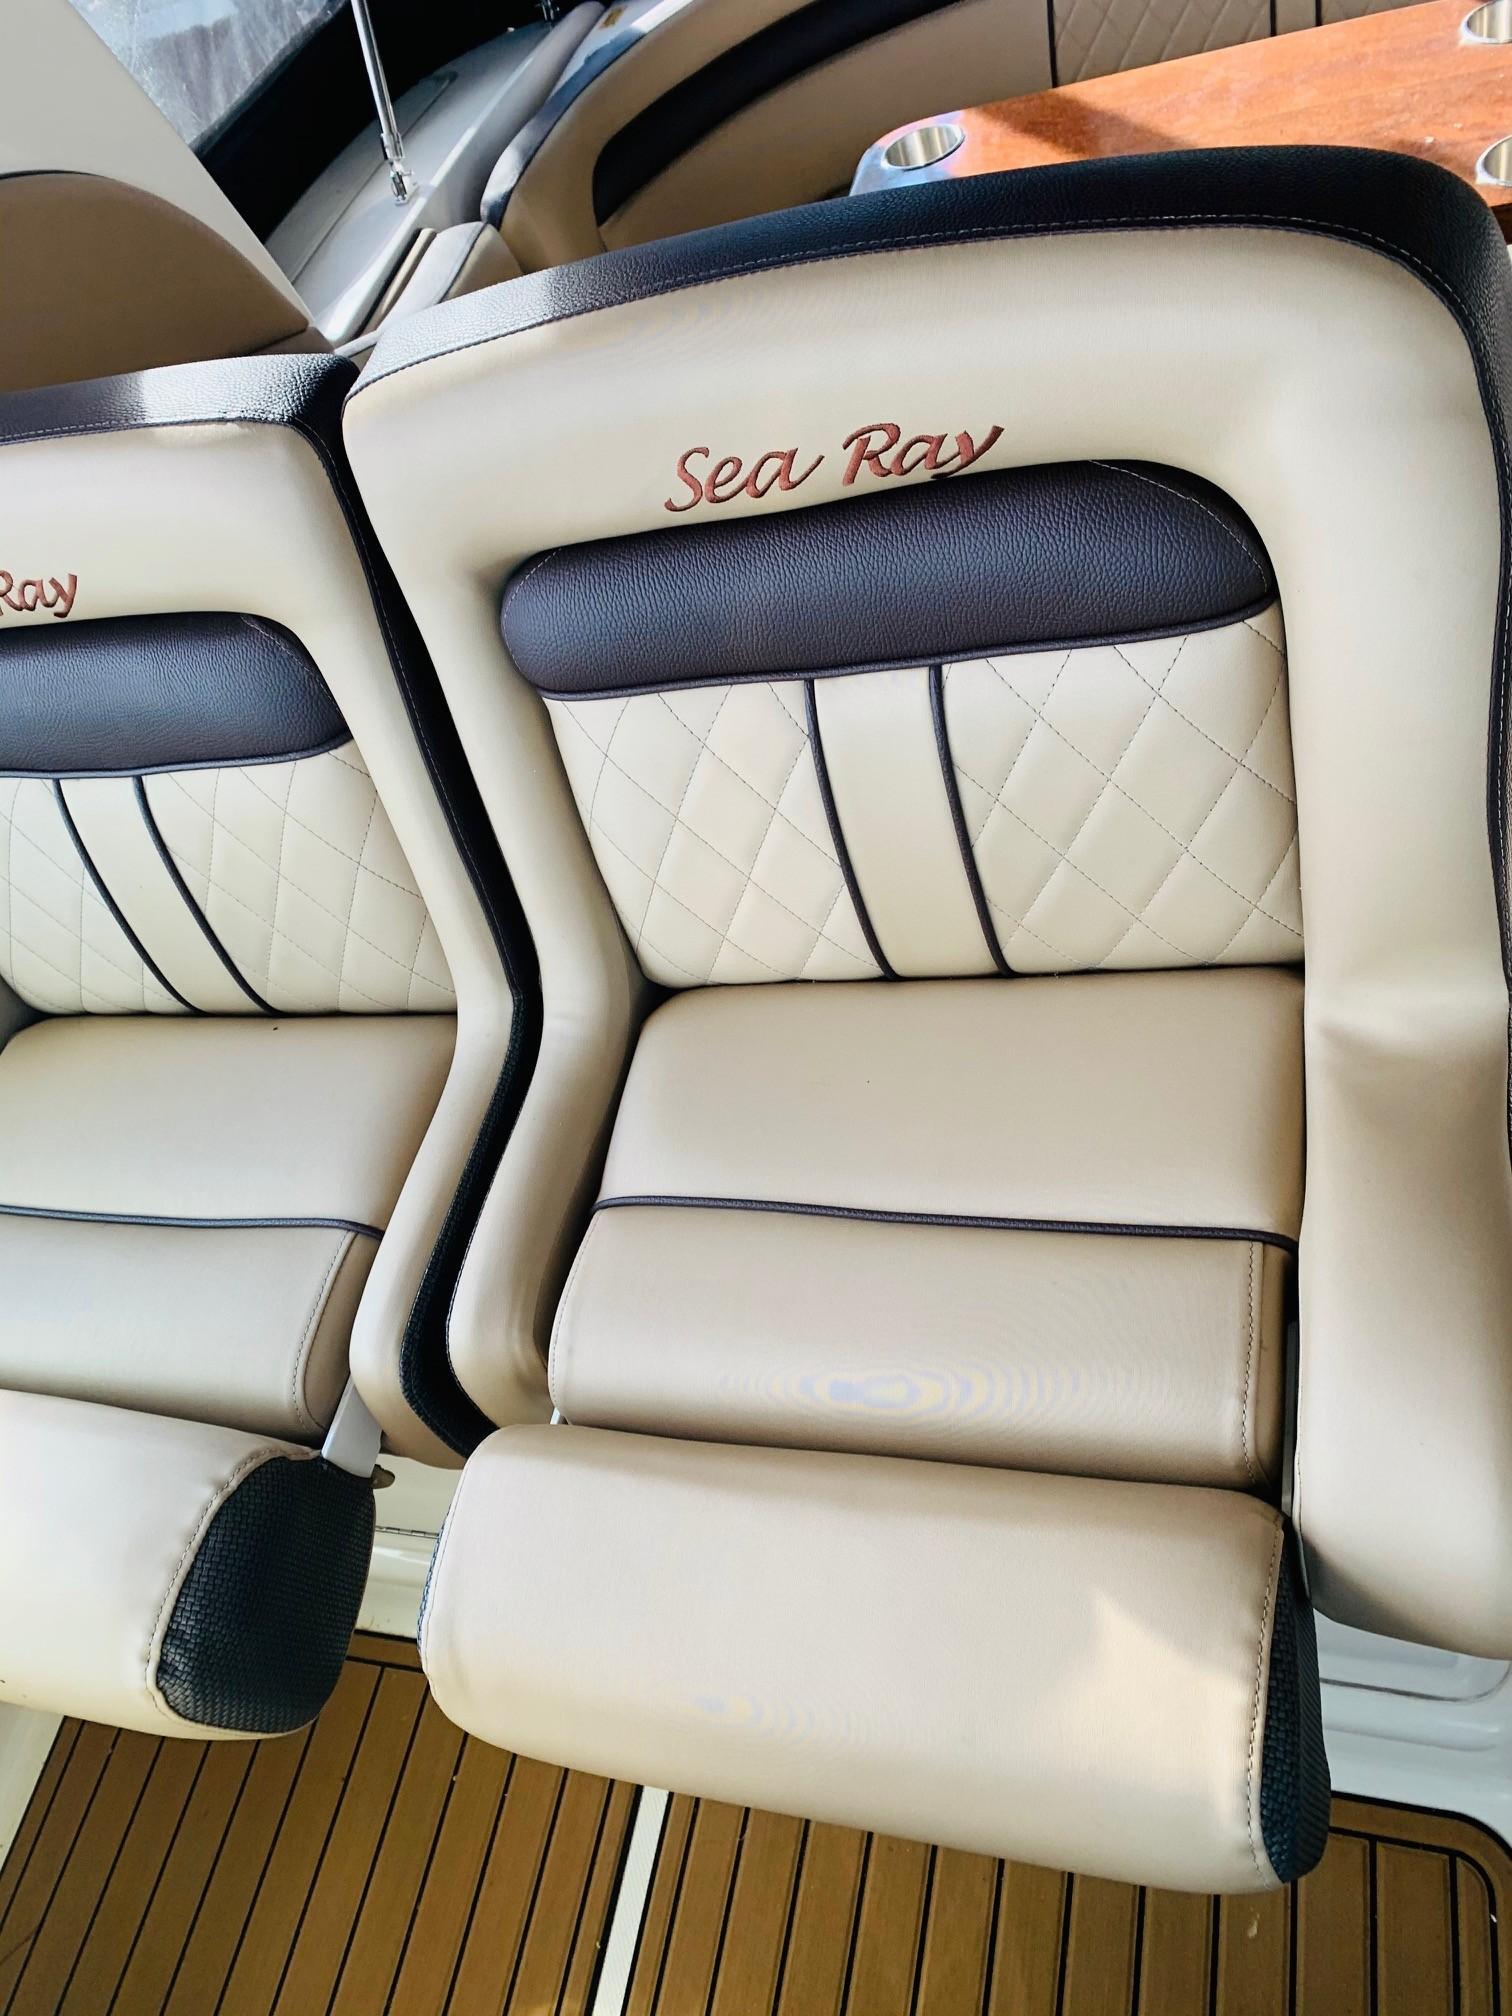 Sea Ray 320 Sundancer - Helm Seating